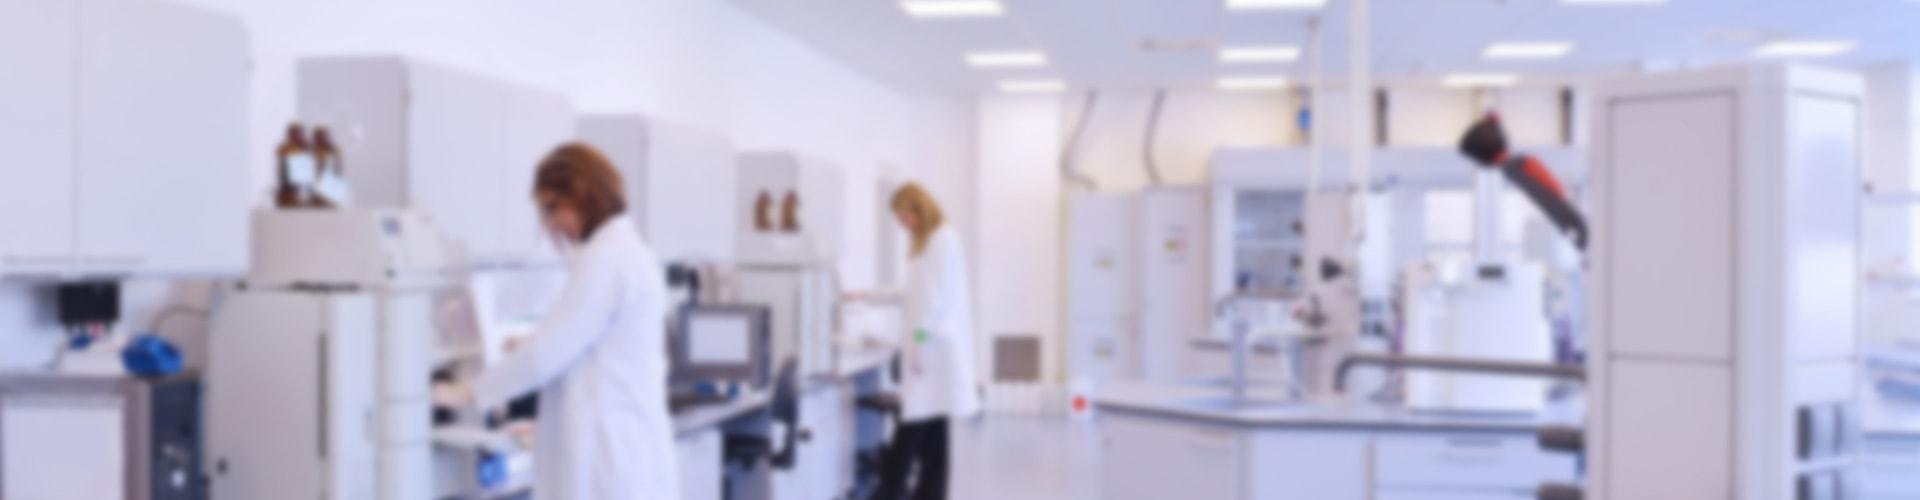 microplanet-laboratory-desenfocado